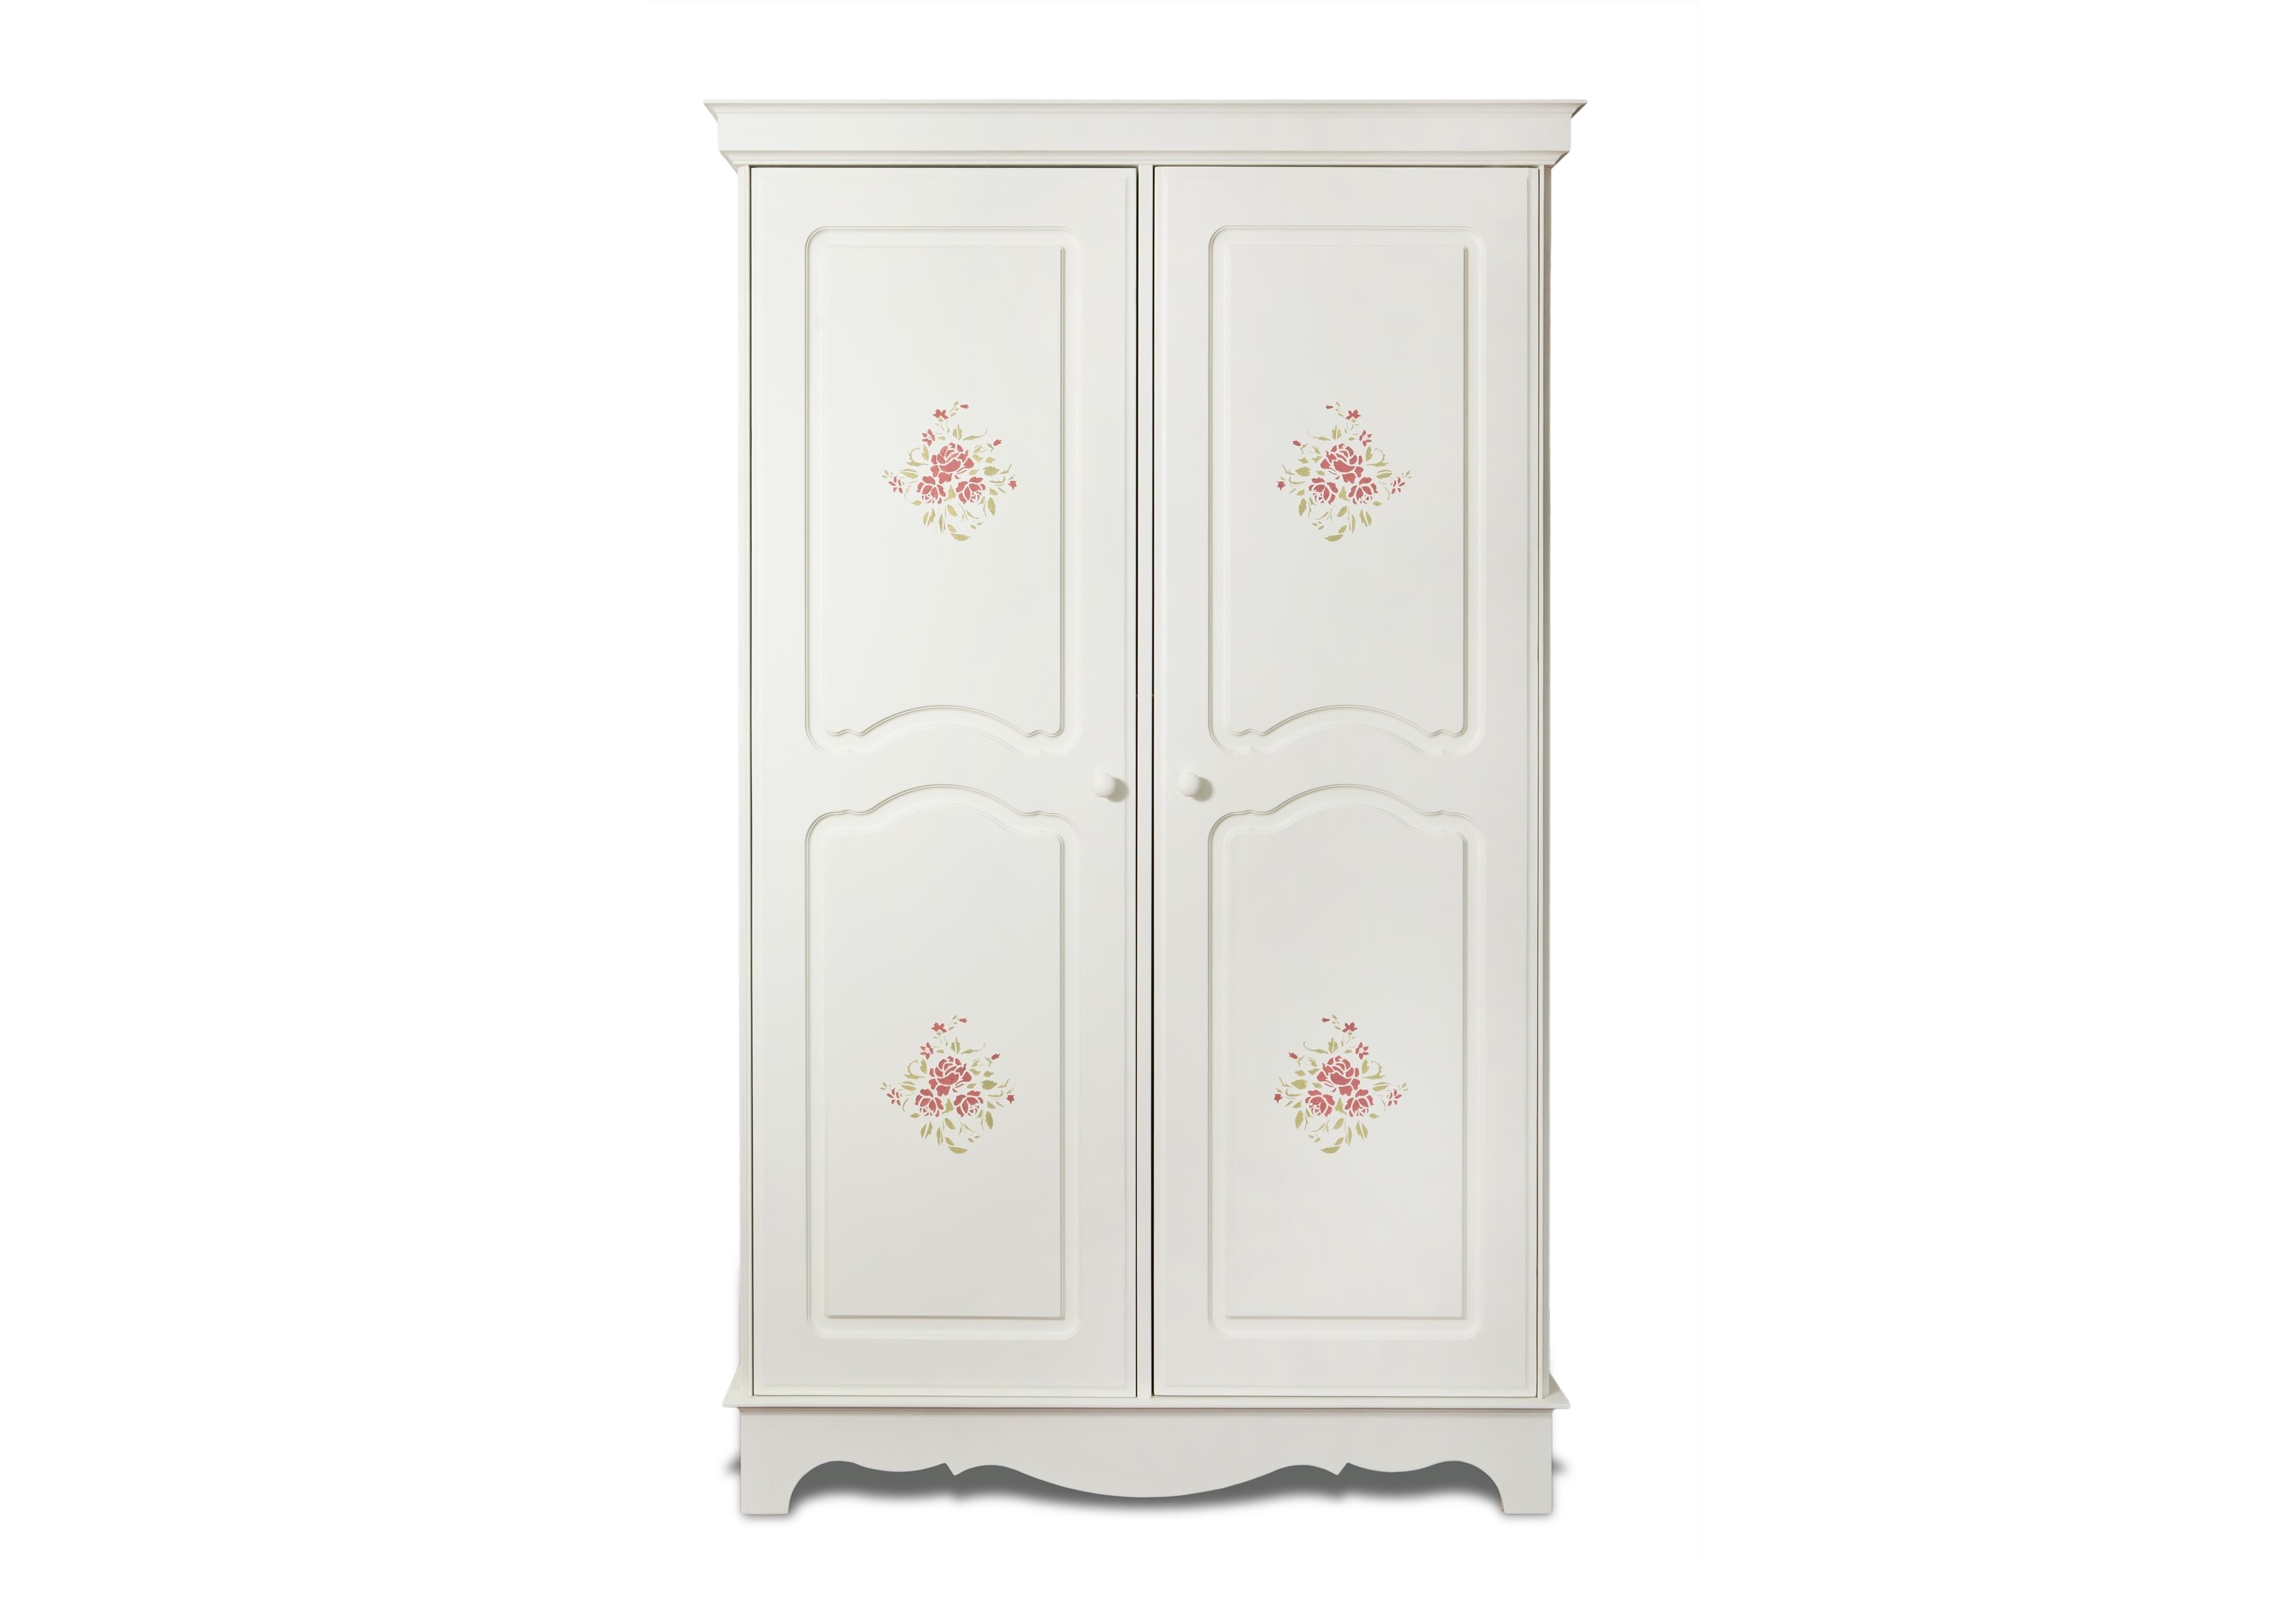 Шкаф Belle Fleur Color?Платяные шкафы<br>Отделка: Belle Fleur Color? - орнамент из роз.&amp;amp;nbsp;<br><br>Material: Береза<br>Width см: 128<br>Depth см: 59,5<br>Height см: 201